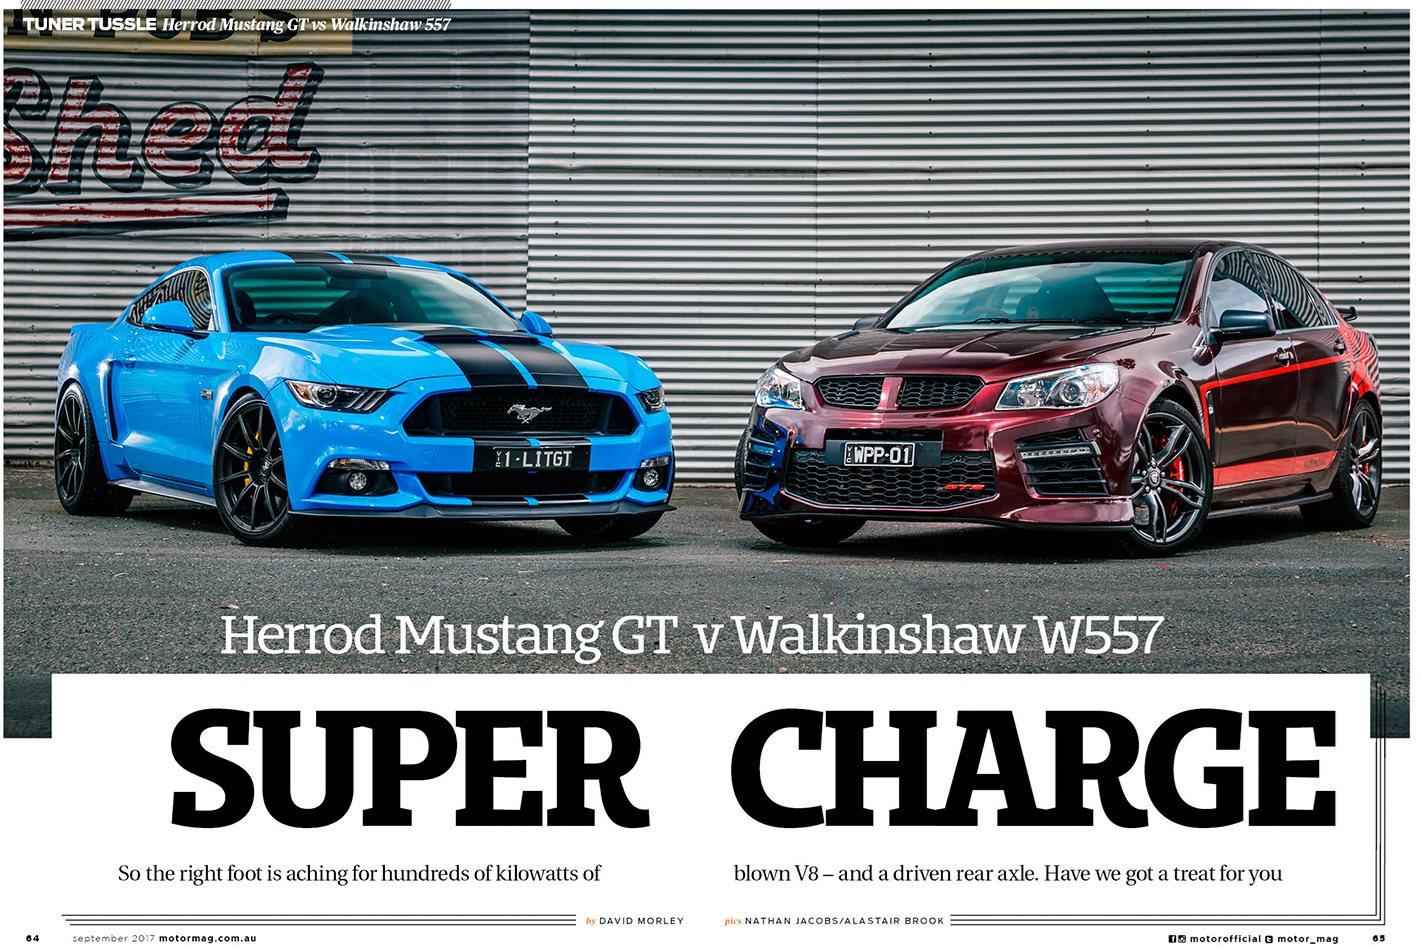 Herrod-Mutsang-GT-vs-Walkinshaw-W557.jpg